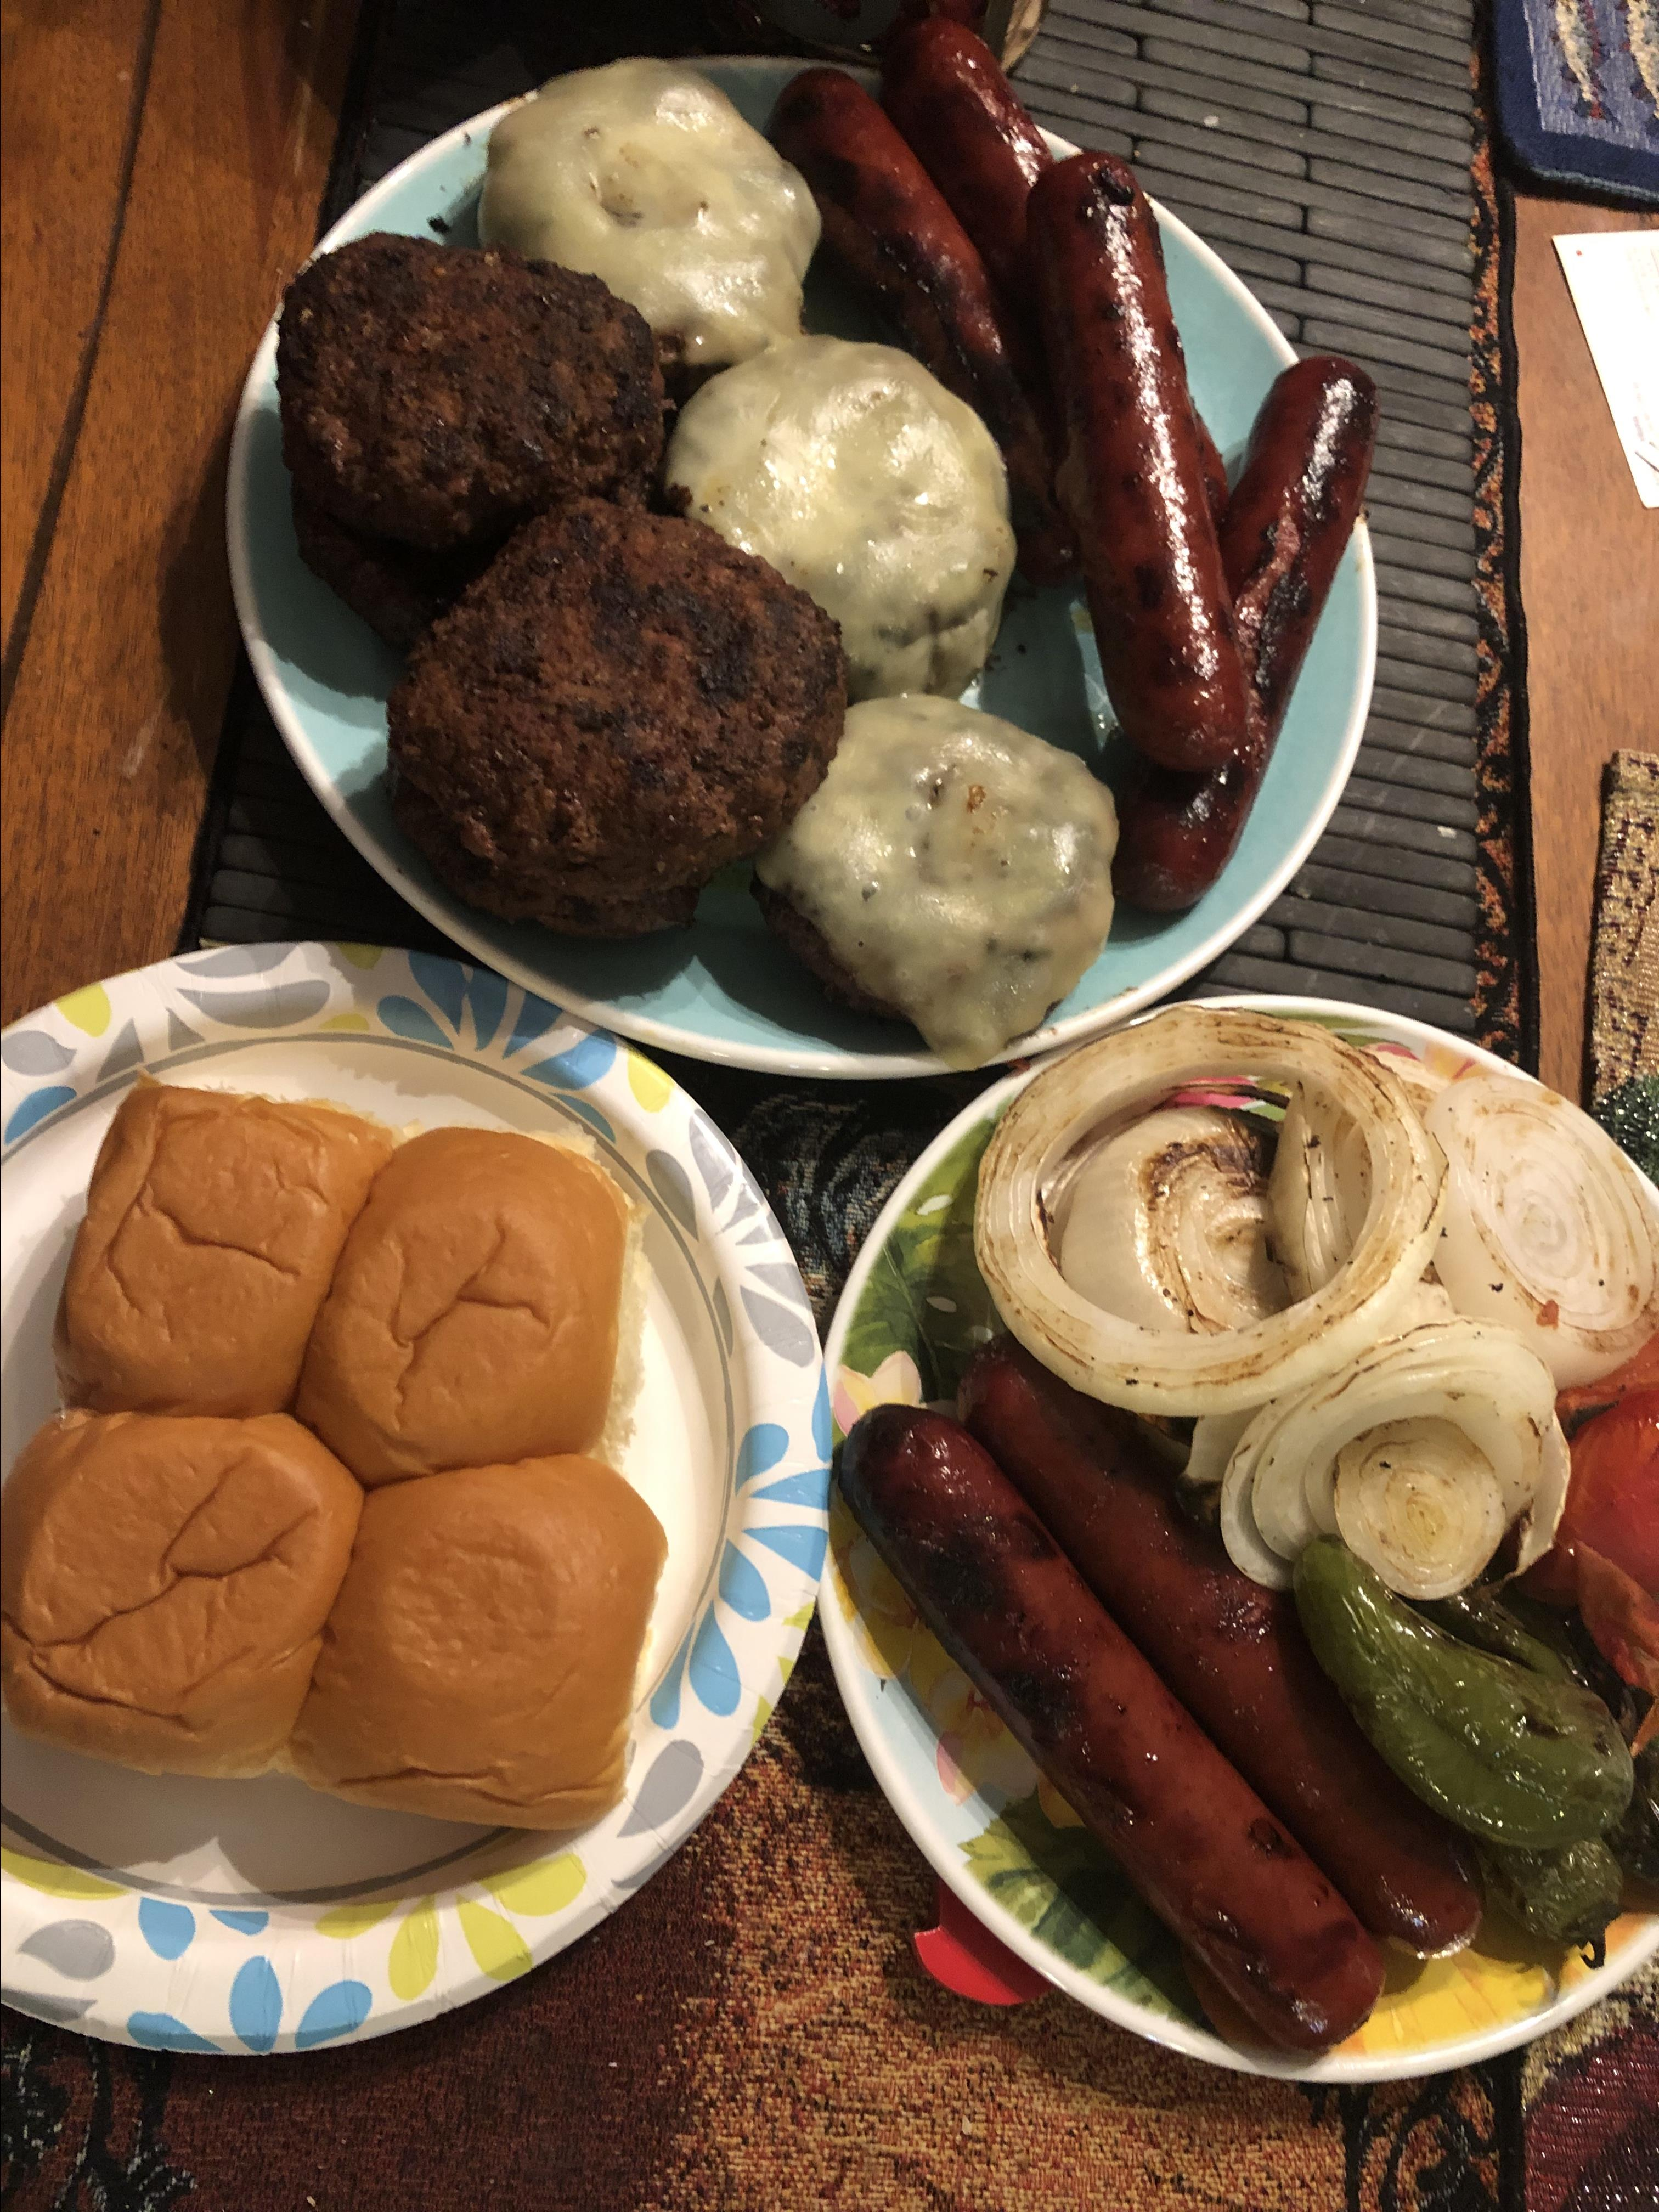 Stacey's Hamburger Seasoning